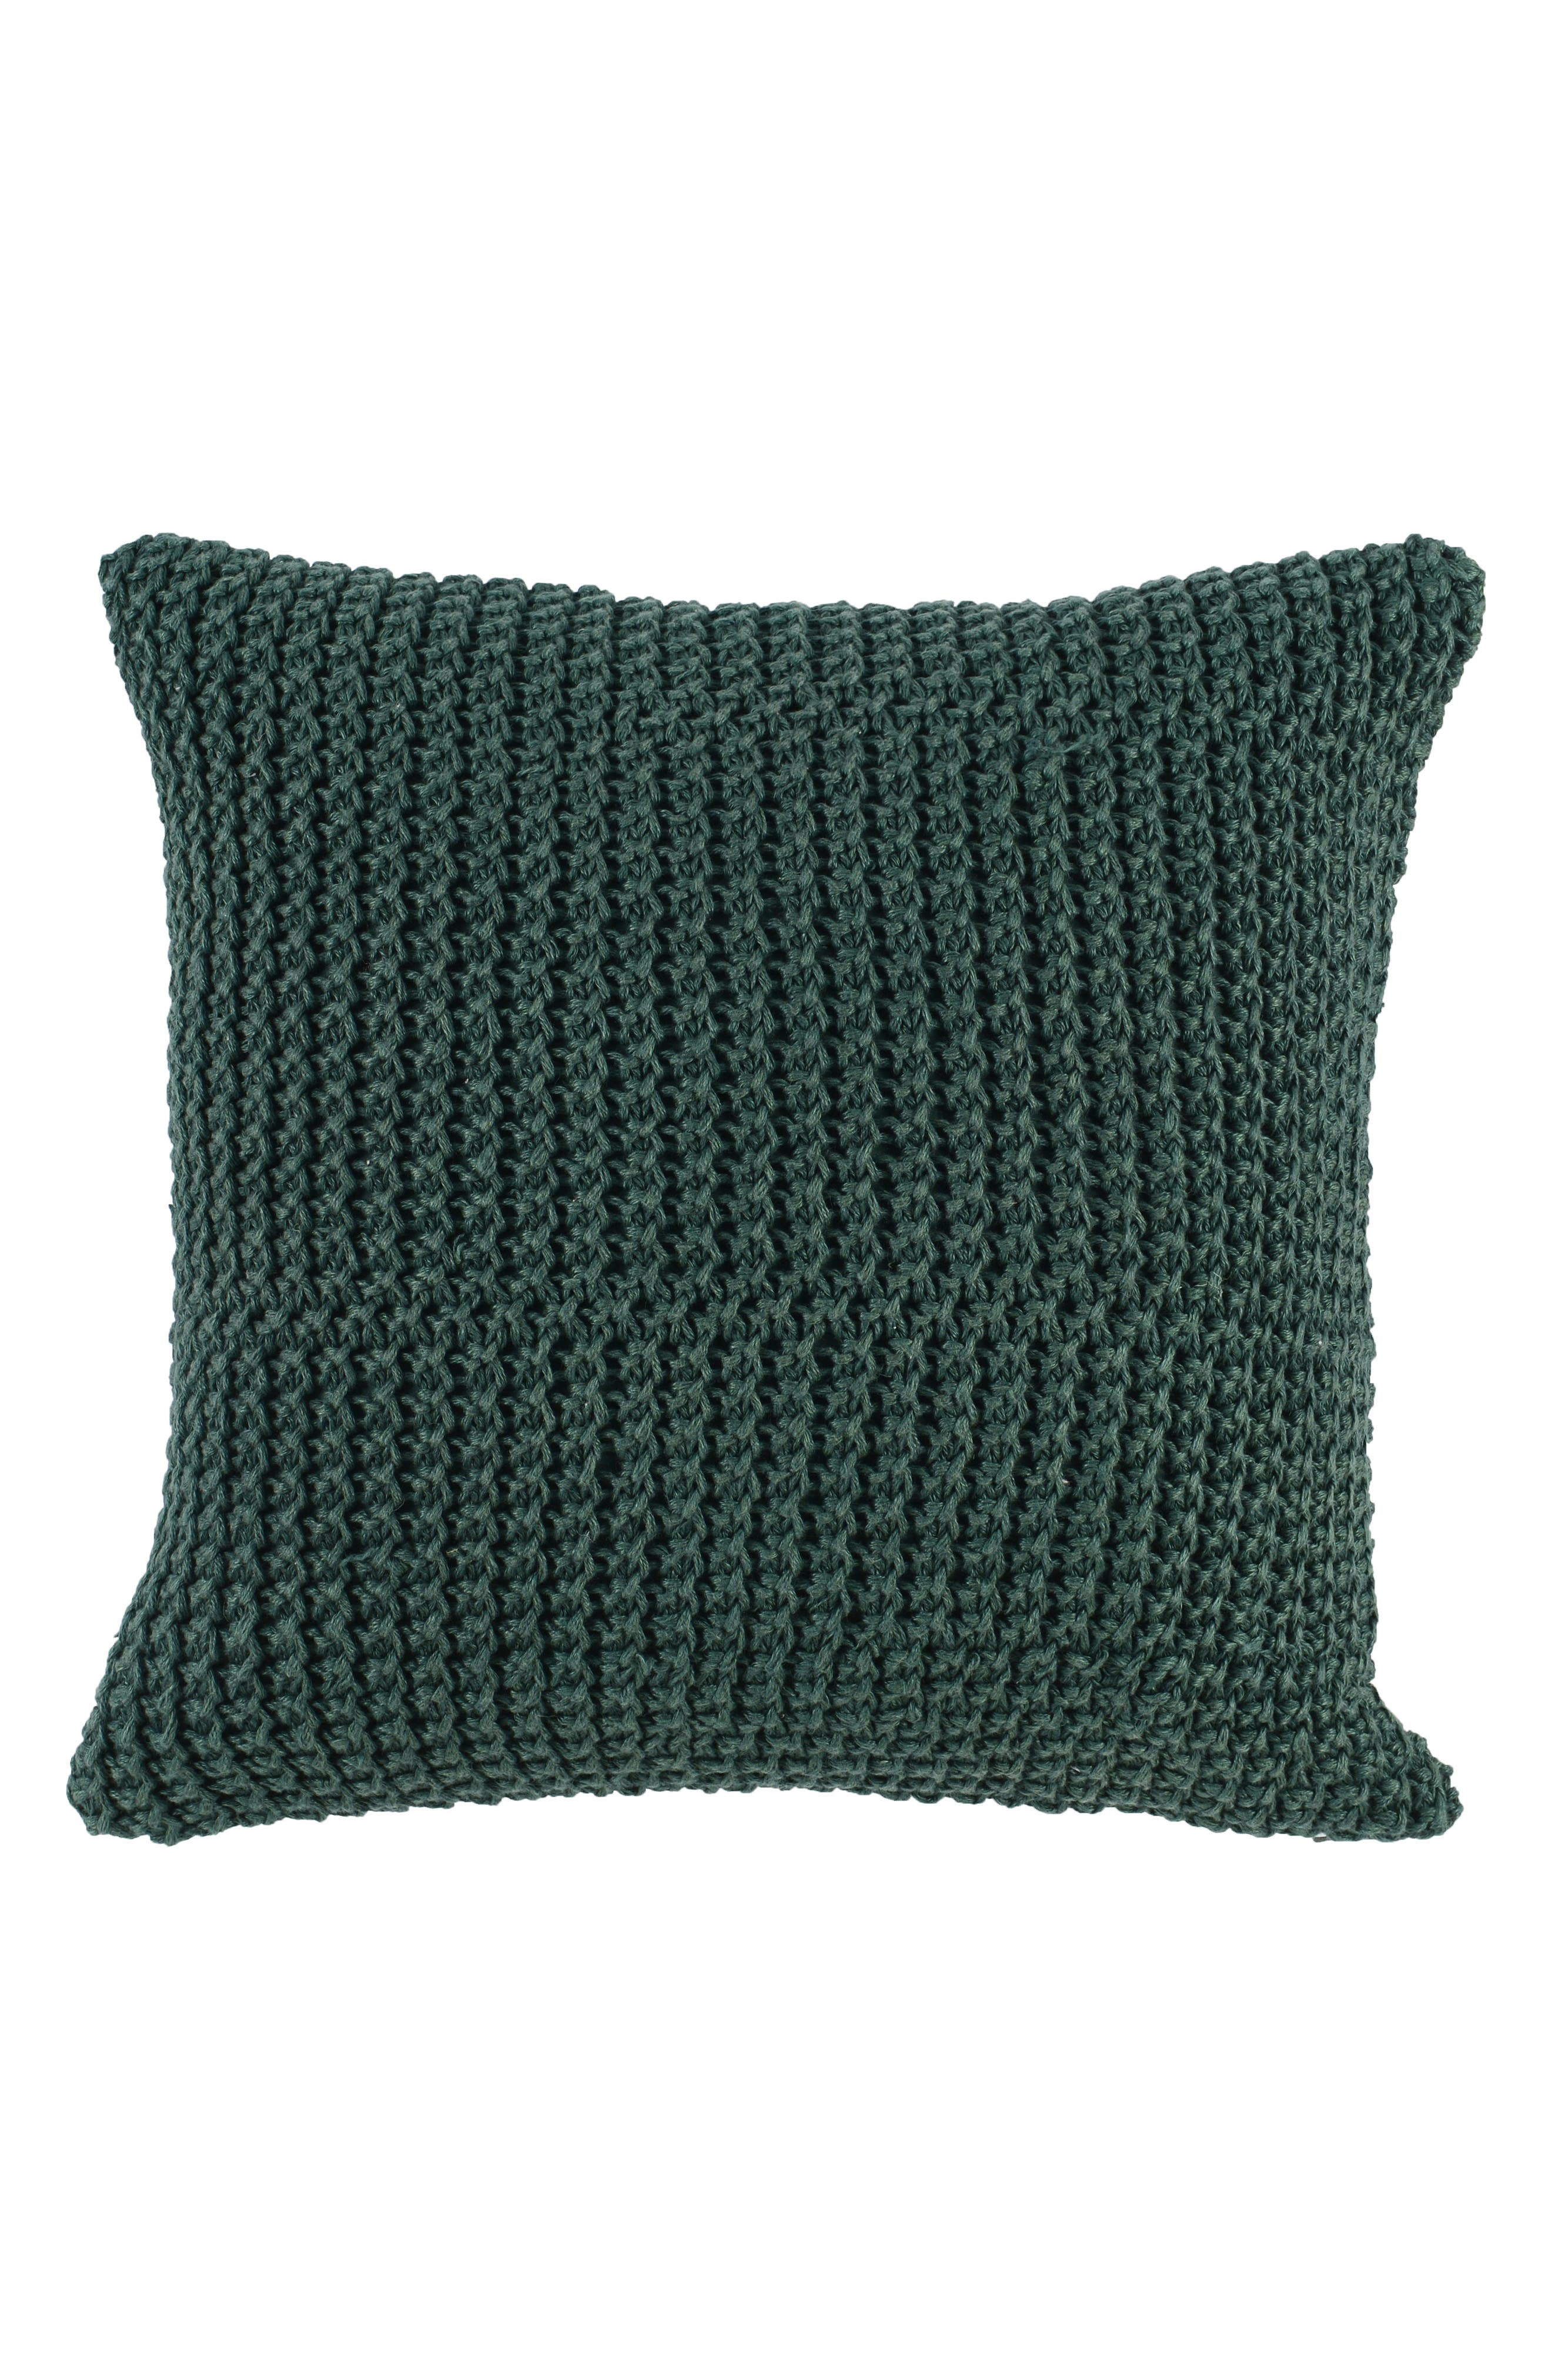 Nita Accent Pillow,                         Main,                         color, Emerald Green